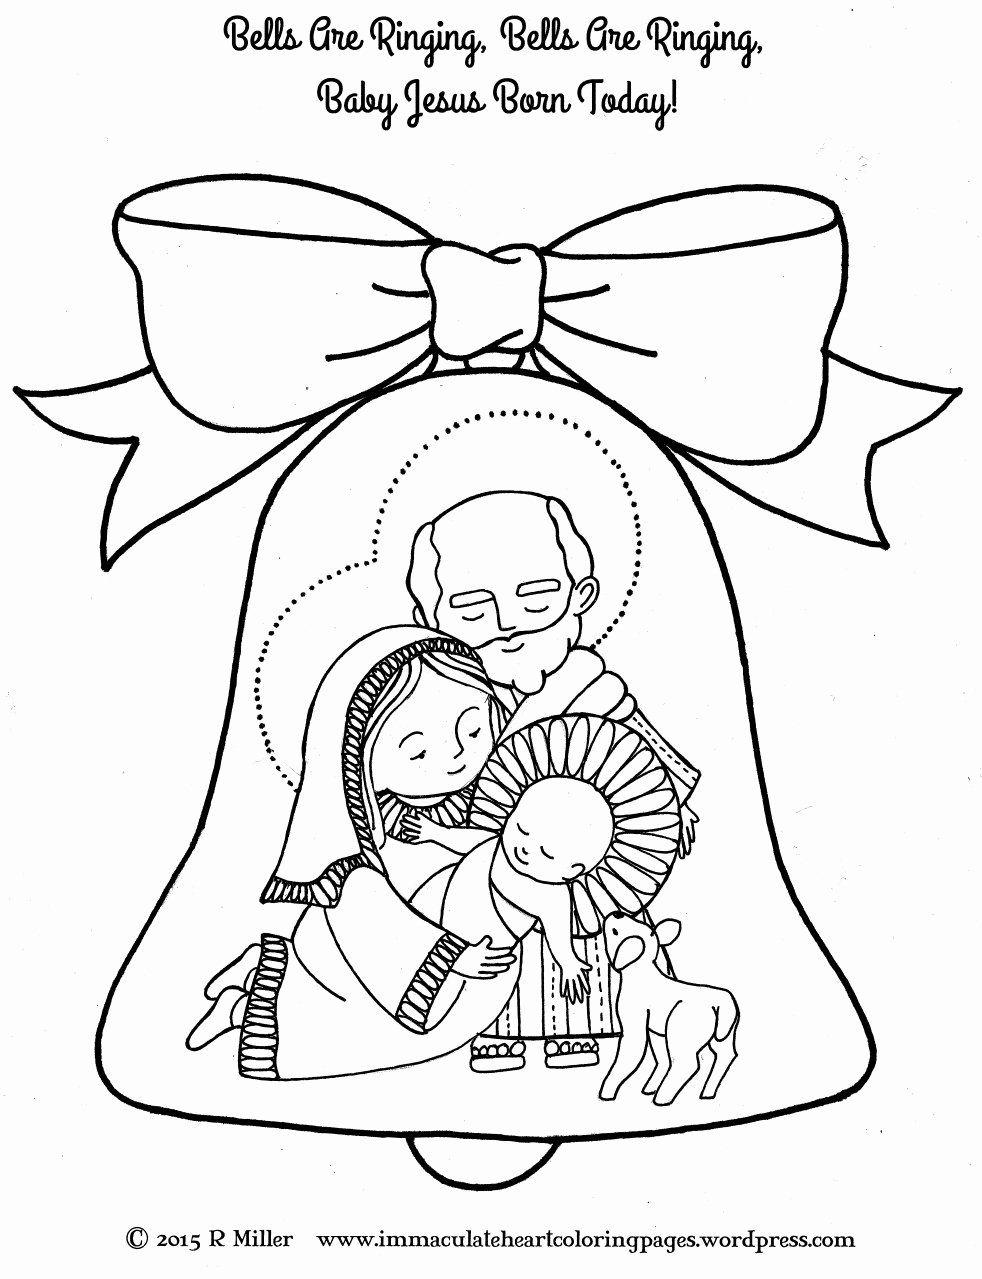 Advent Wreath Coloring Page Catholic Luxury Advent Sheets For Catholics Coloring Pages Nativity Coloring Pages Nativity Coloring Christmas Coloring Books